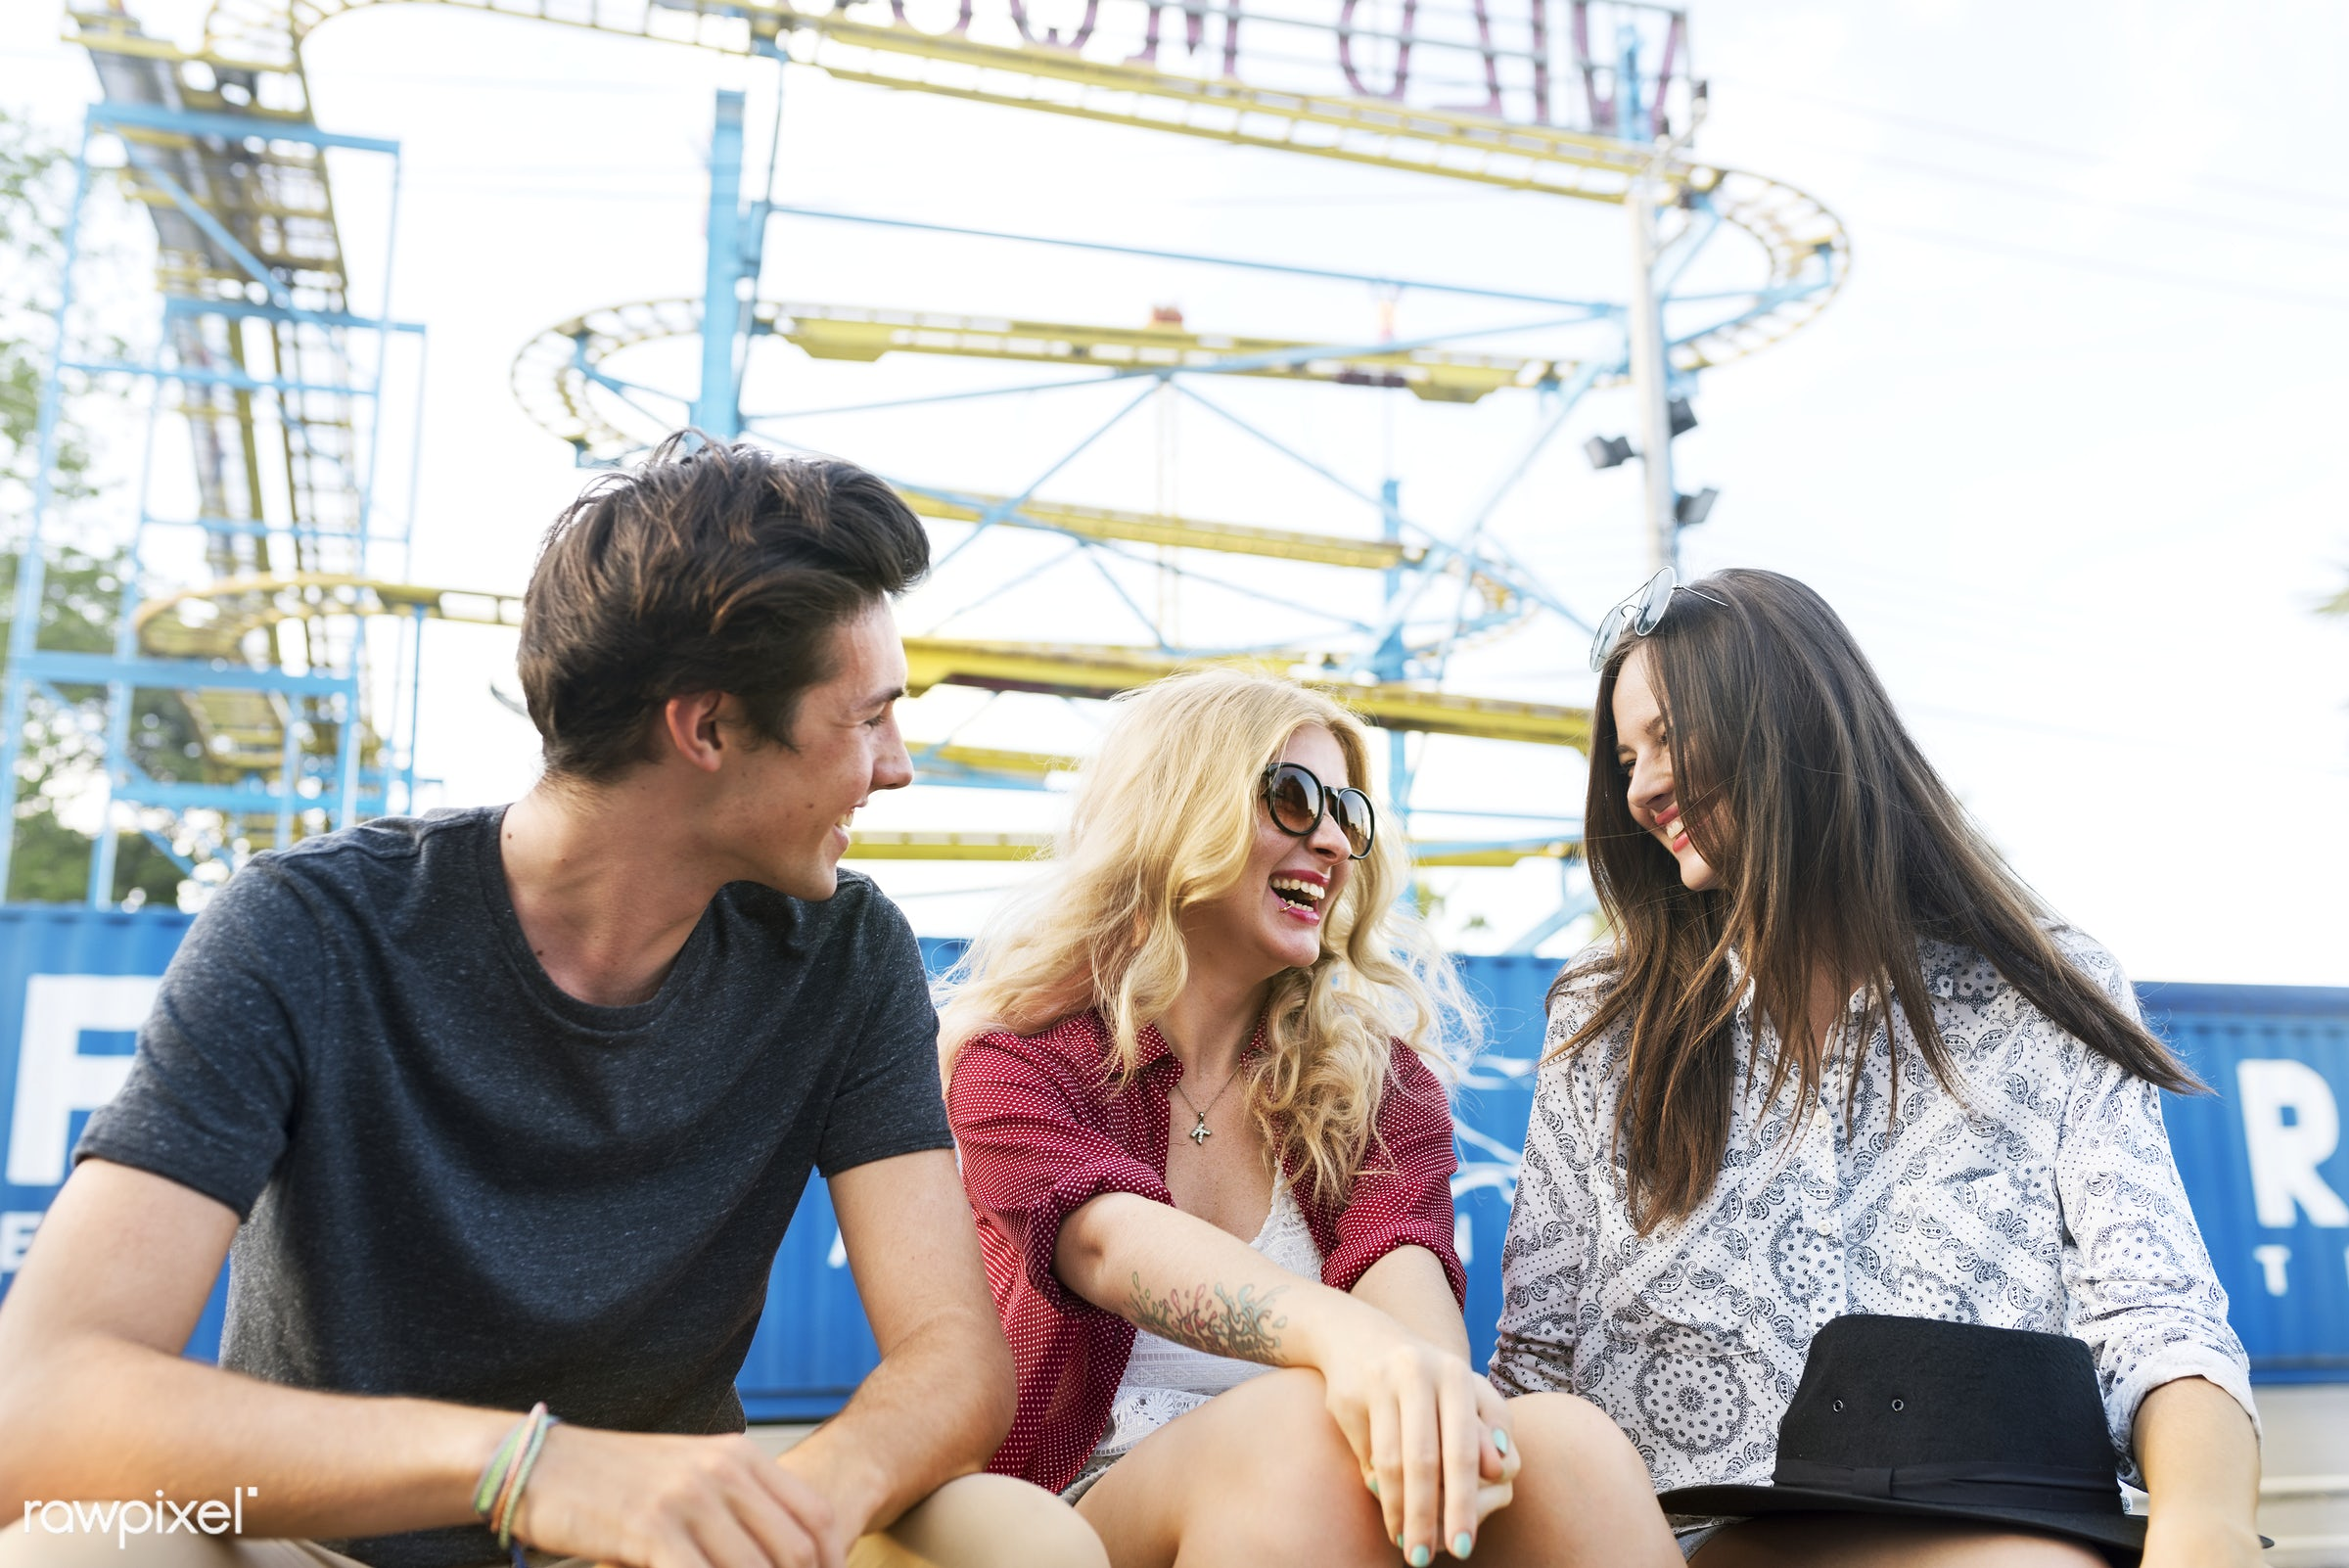 A group of friends is enjoying the amusement park - amusement park, conversation, enjoyment, expression, feeling, friends,...